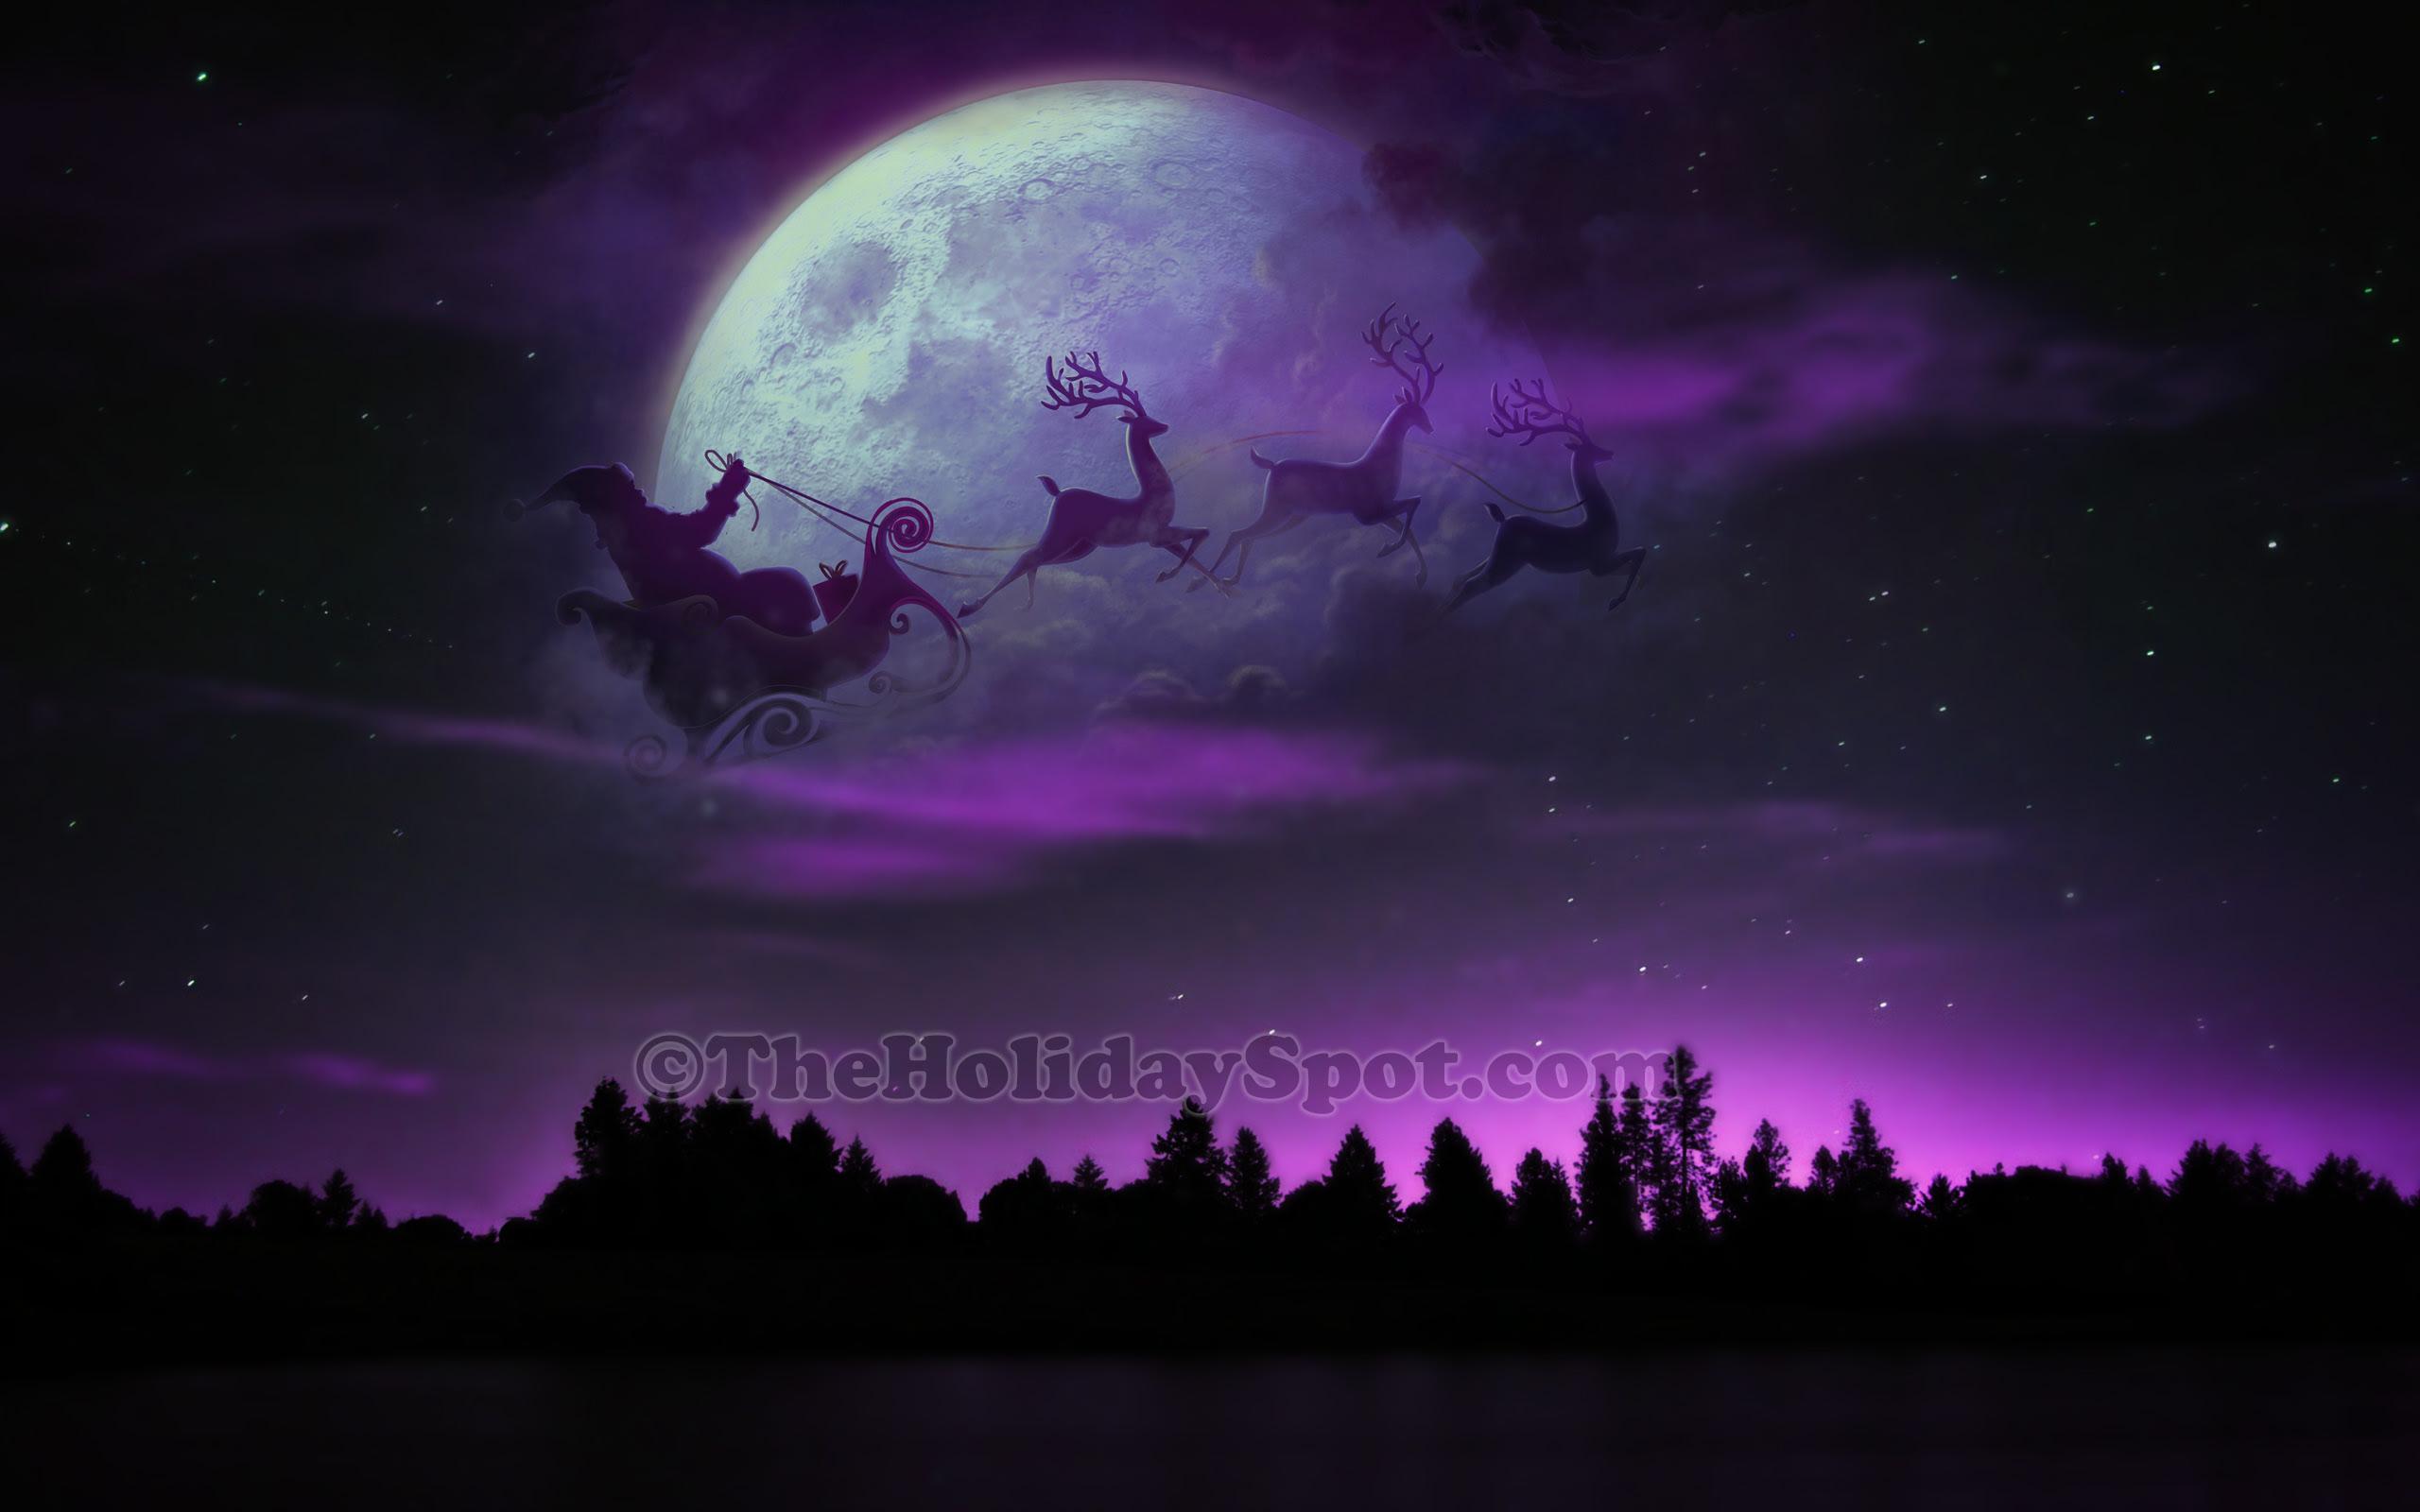 hd wallpaper santa sleigh and reindeer at christmas night